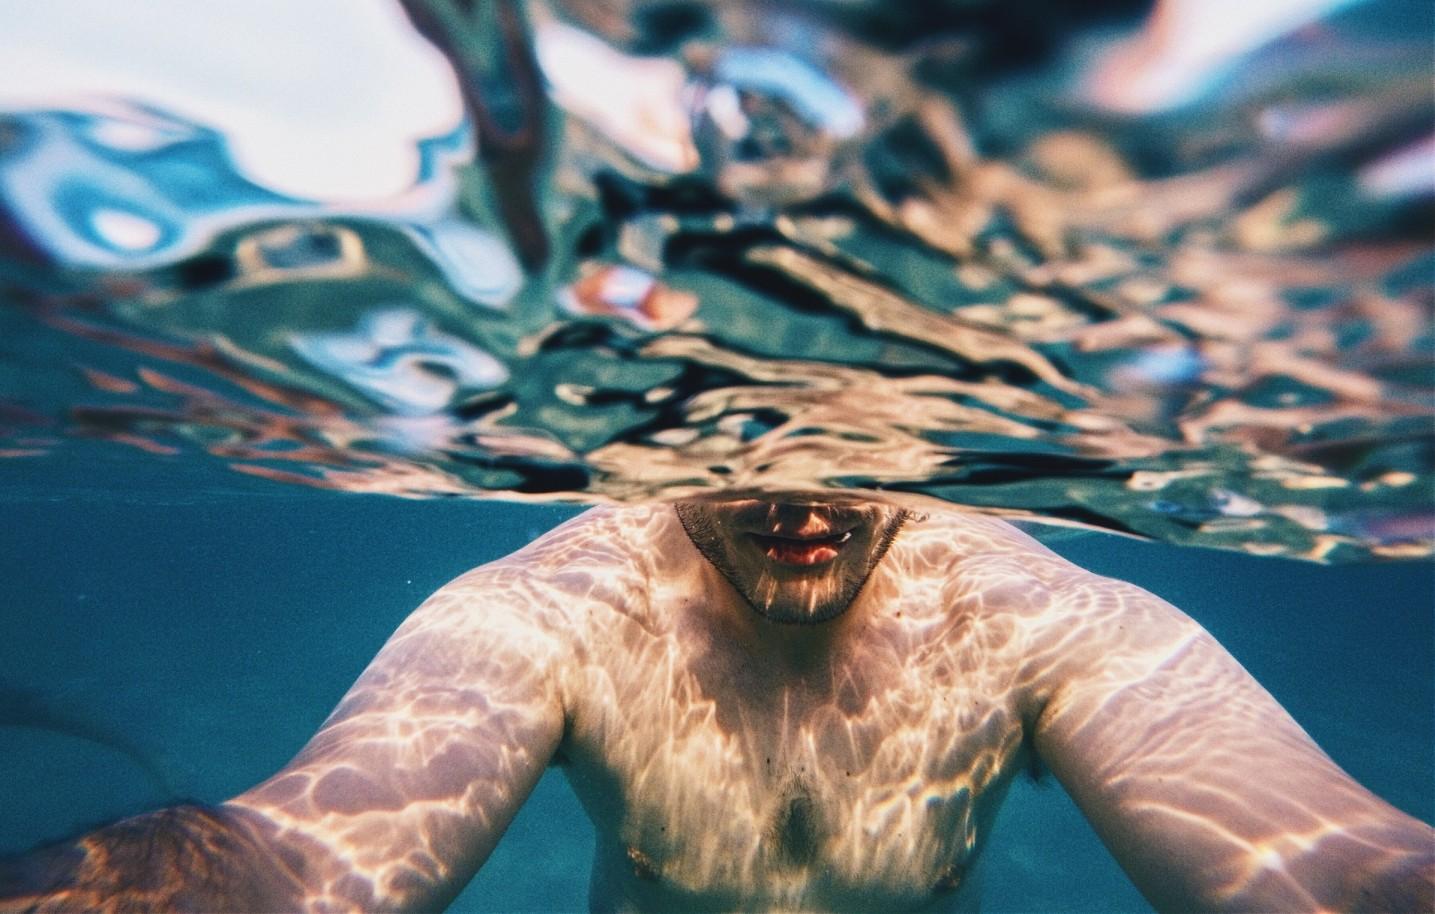 Magas a vérnyomása? Ússzon!